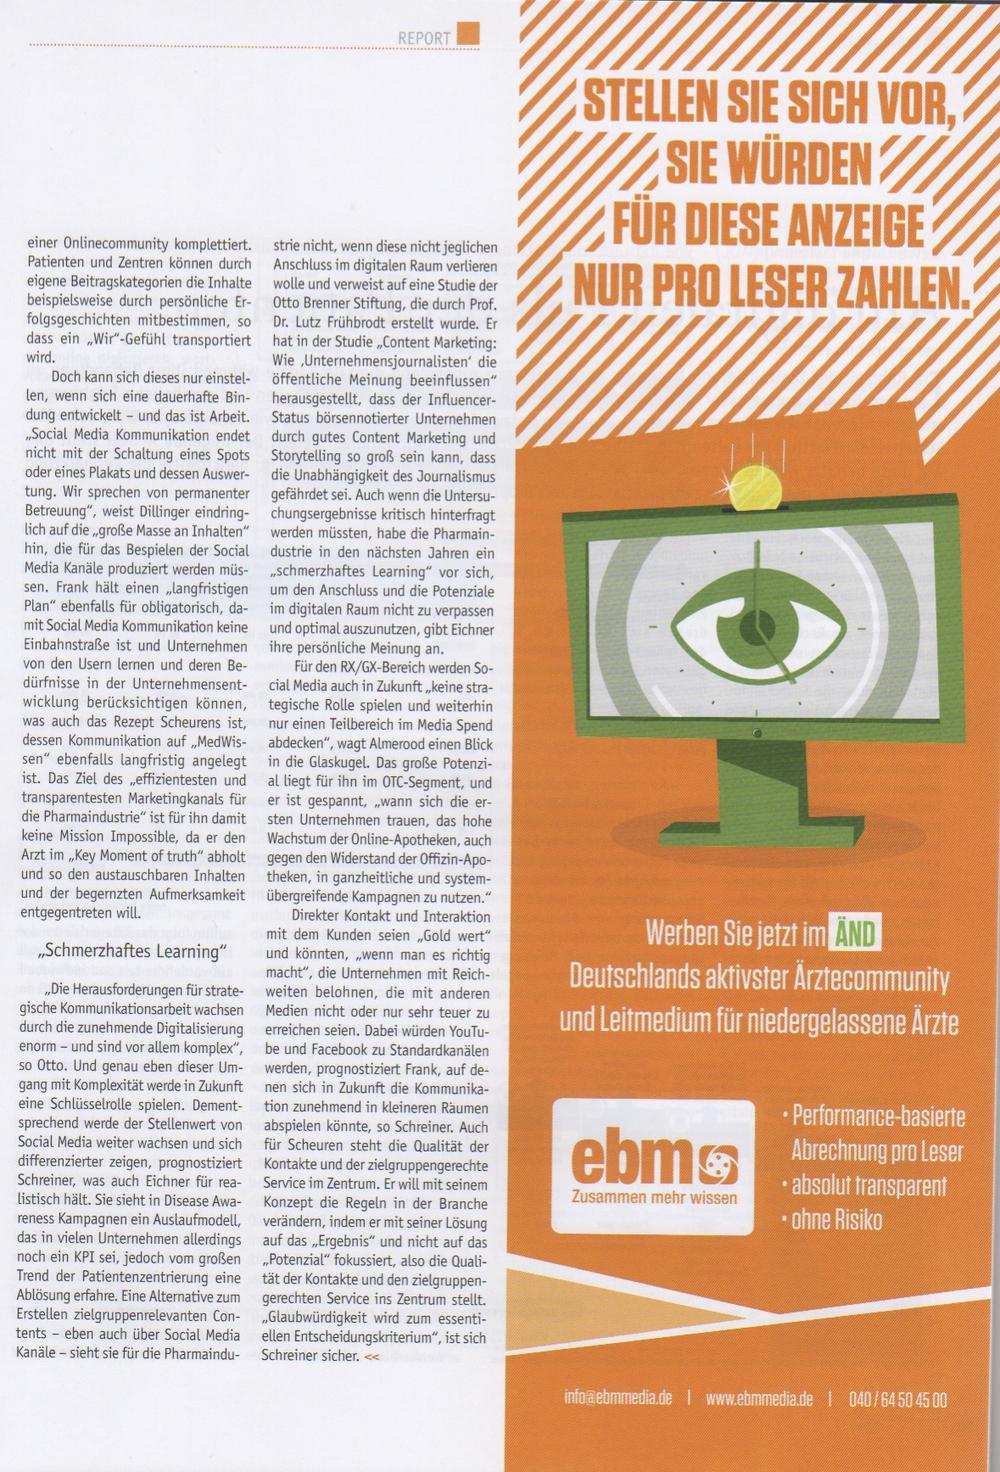 PharmaRelations_Artikel_Juli2016_5.jpg